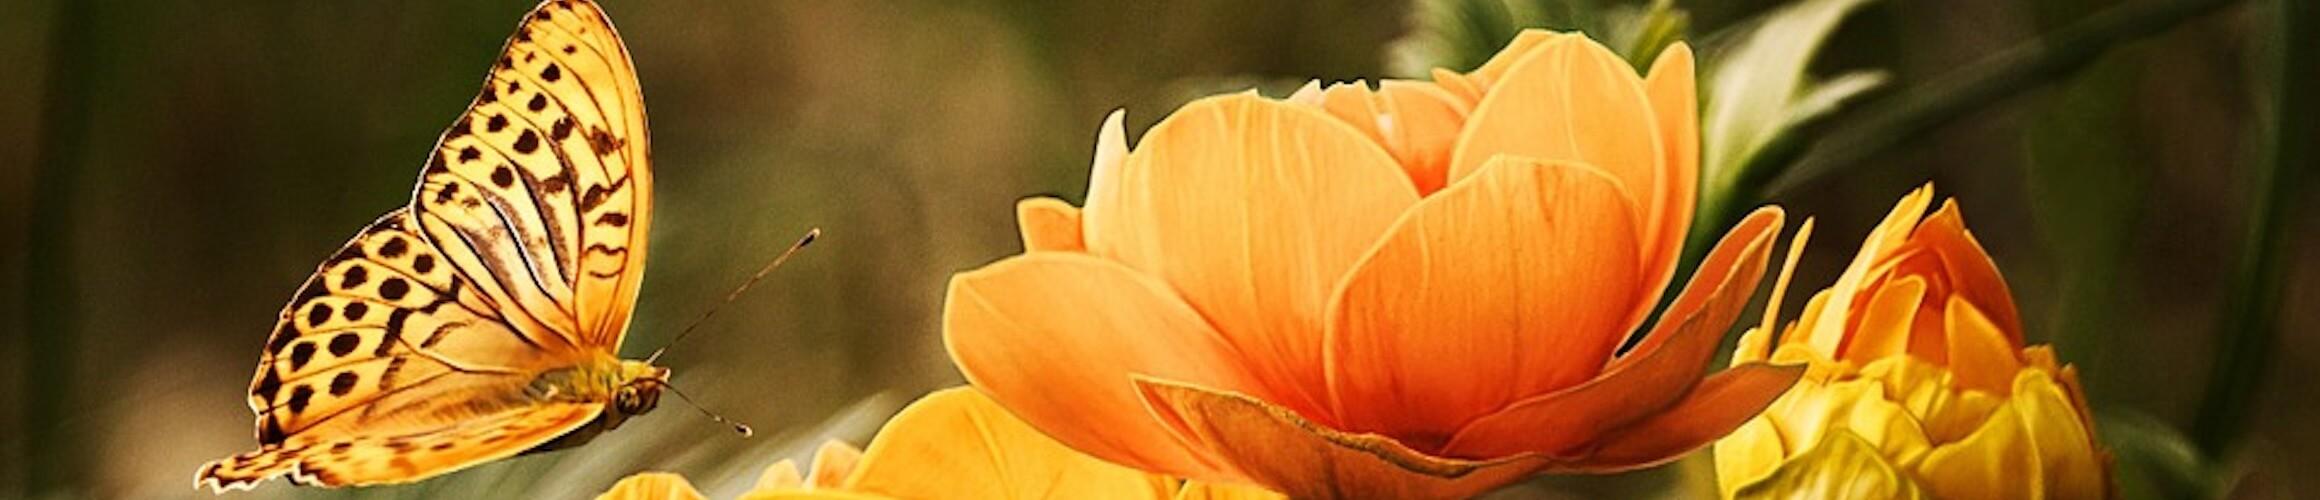 Flowers 19830 960 720